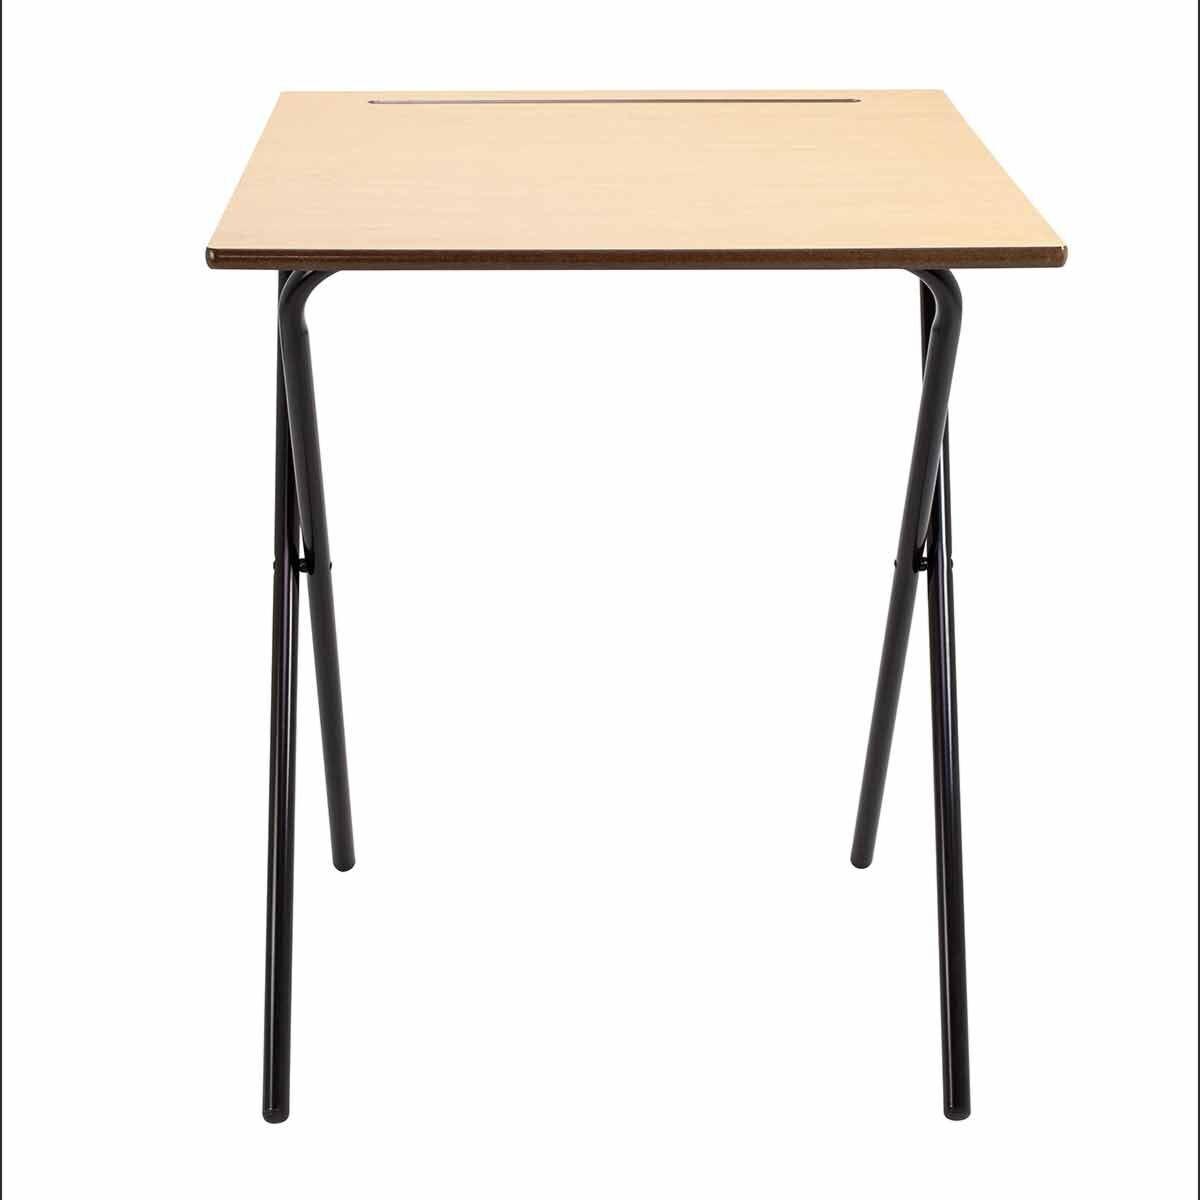 TC Office Folding Economy Exam Desk